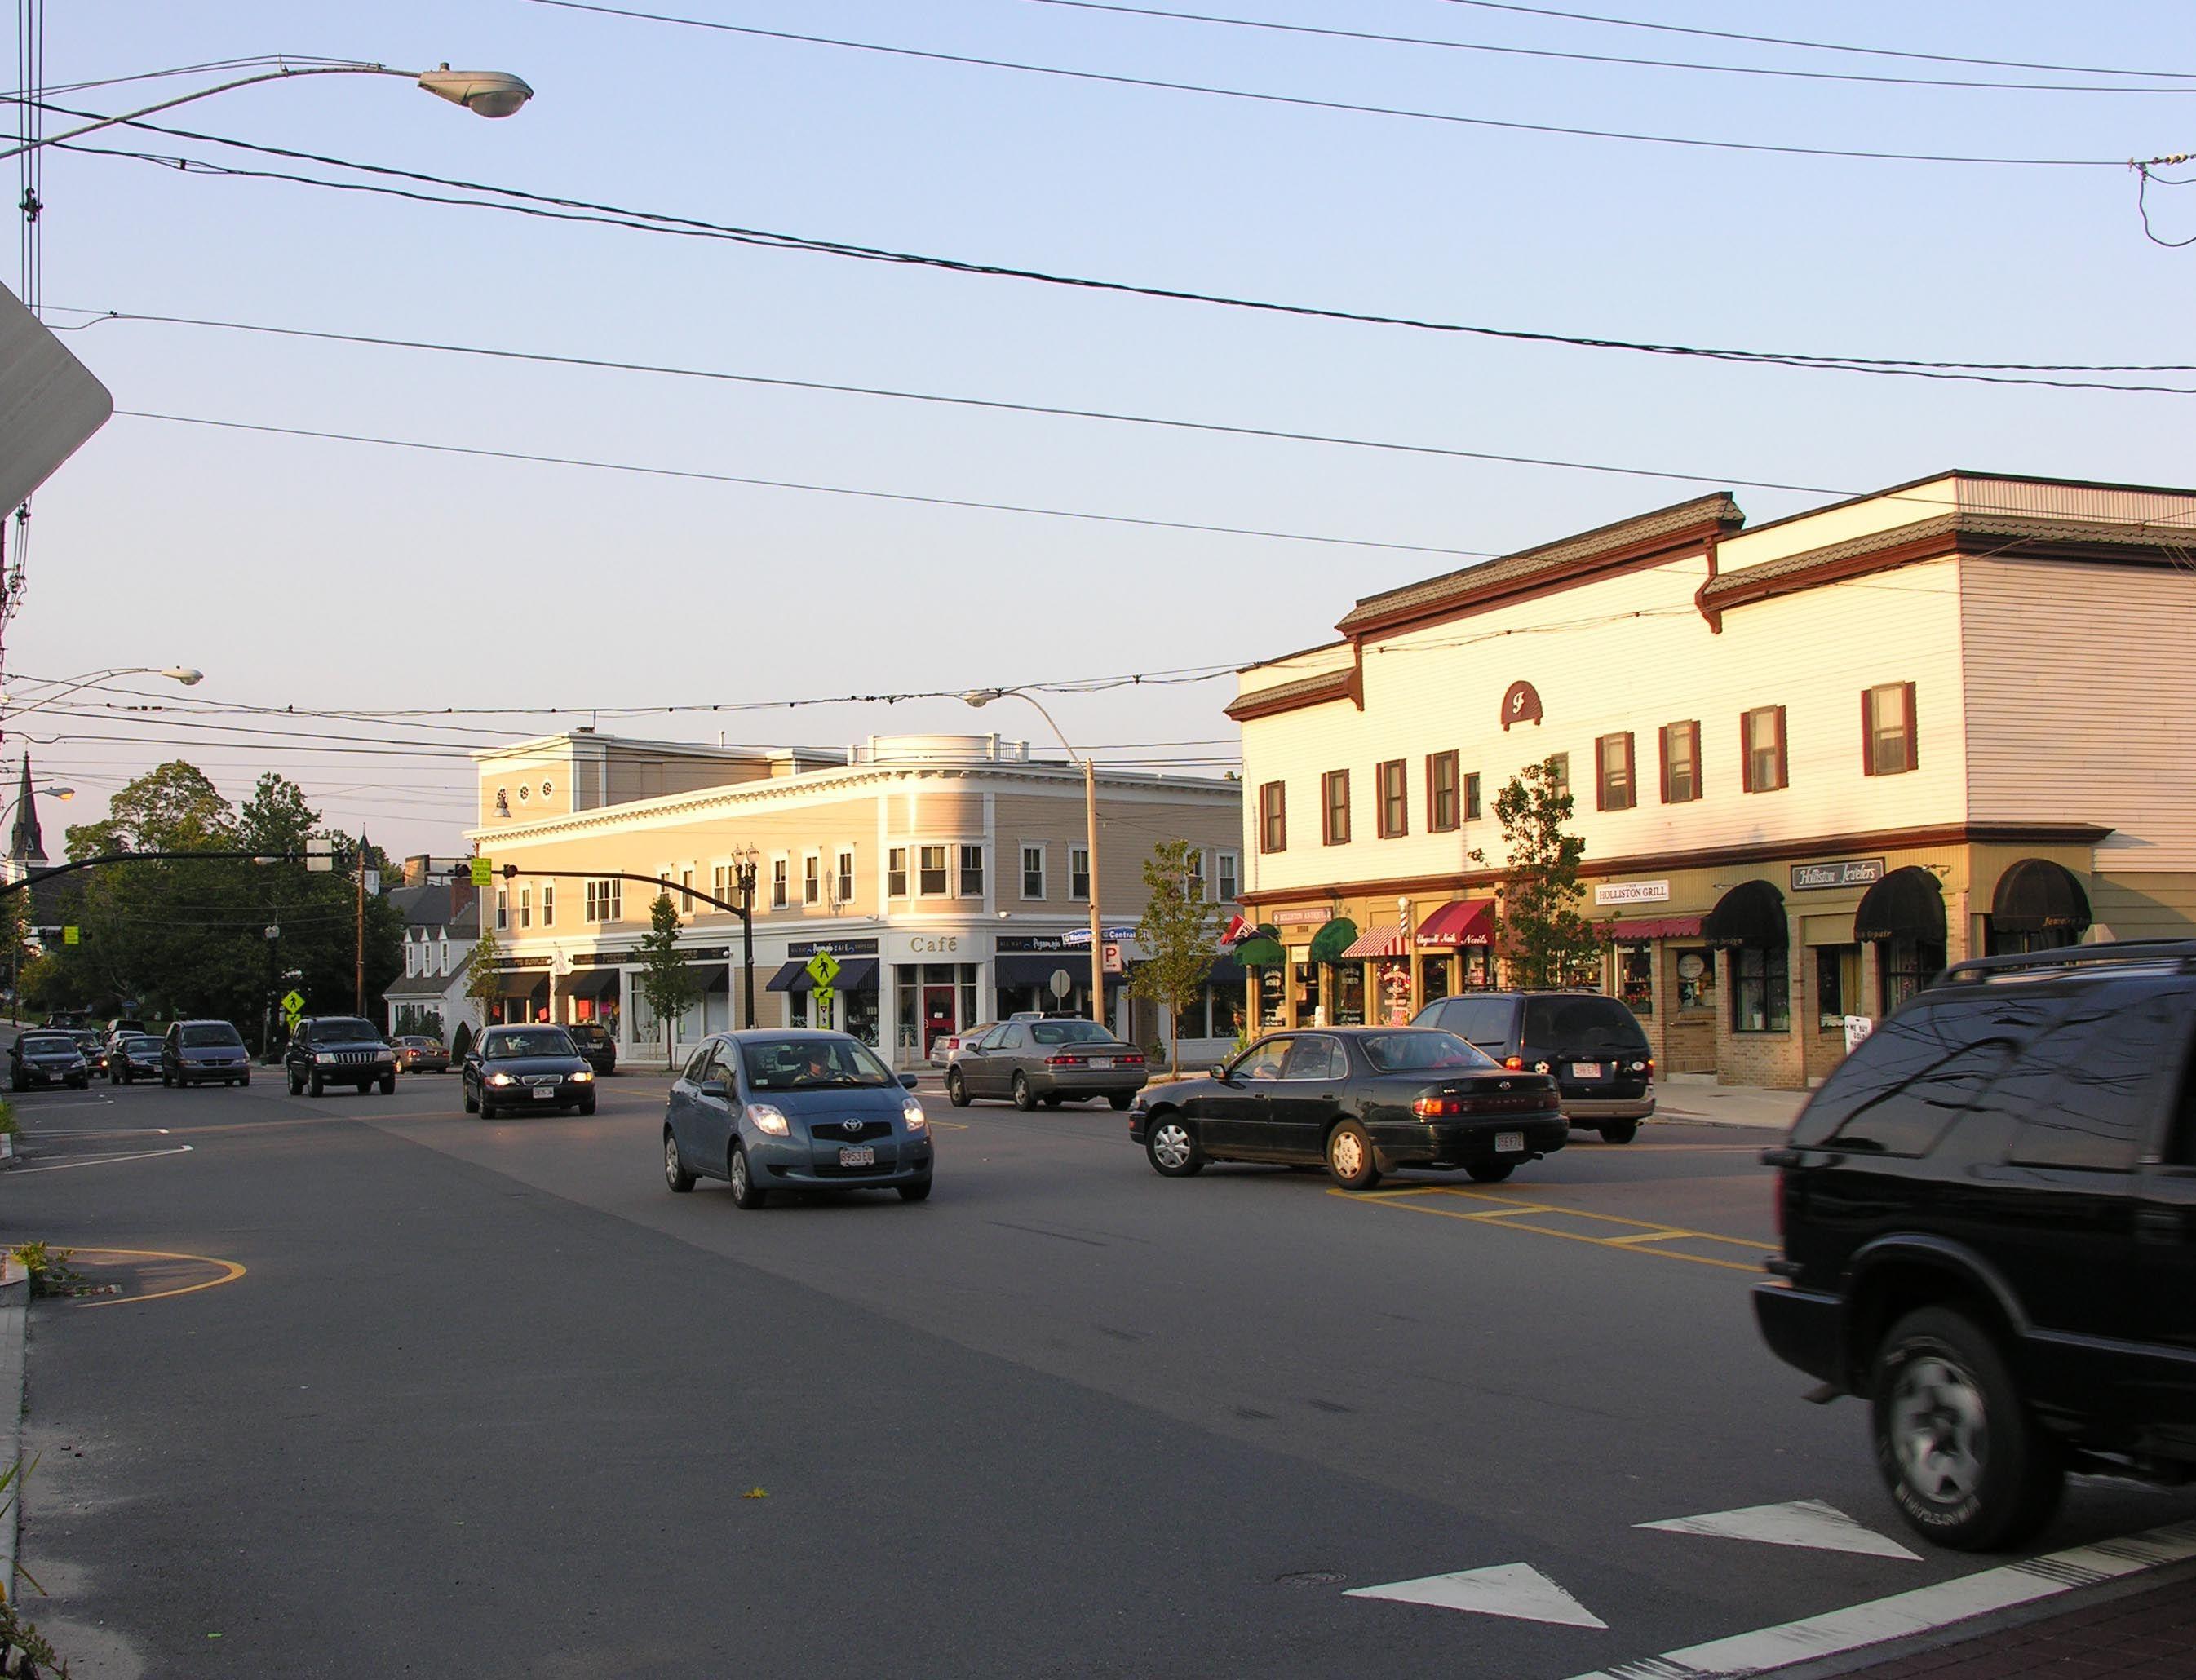 Downtown Holliston Ma